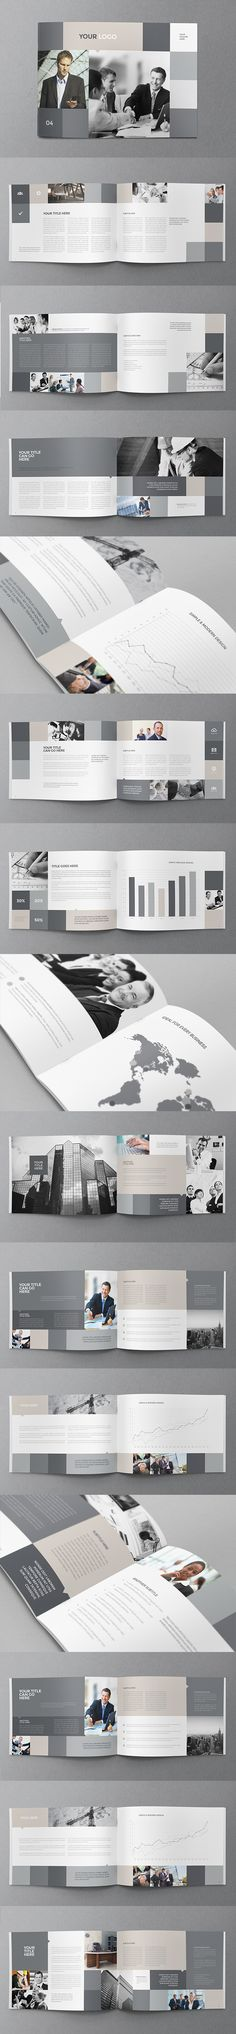 Design Brochure, Brochure Layout, Branding Design, Brochure Template, Graphic Design Books, Book Design, Editorial Layout, Editorial Design, Print Layout